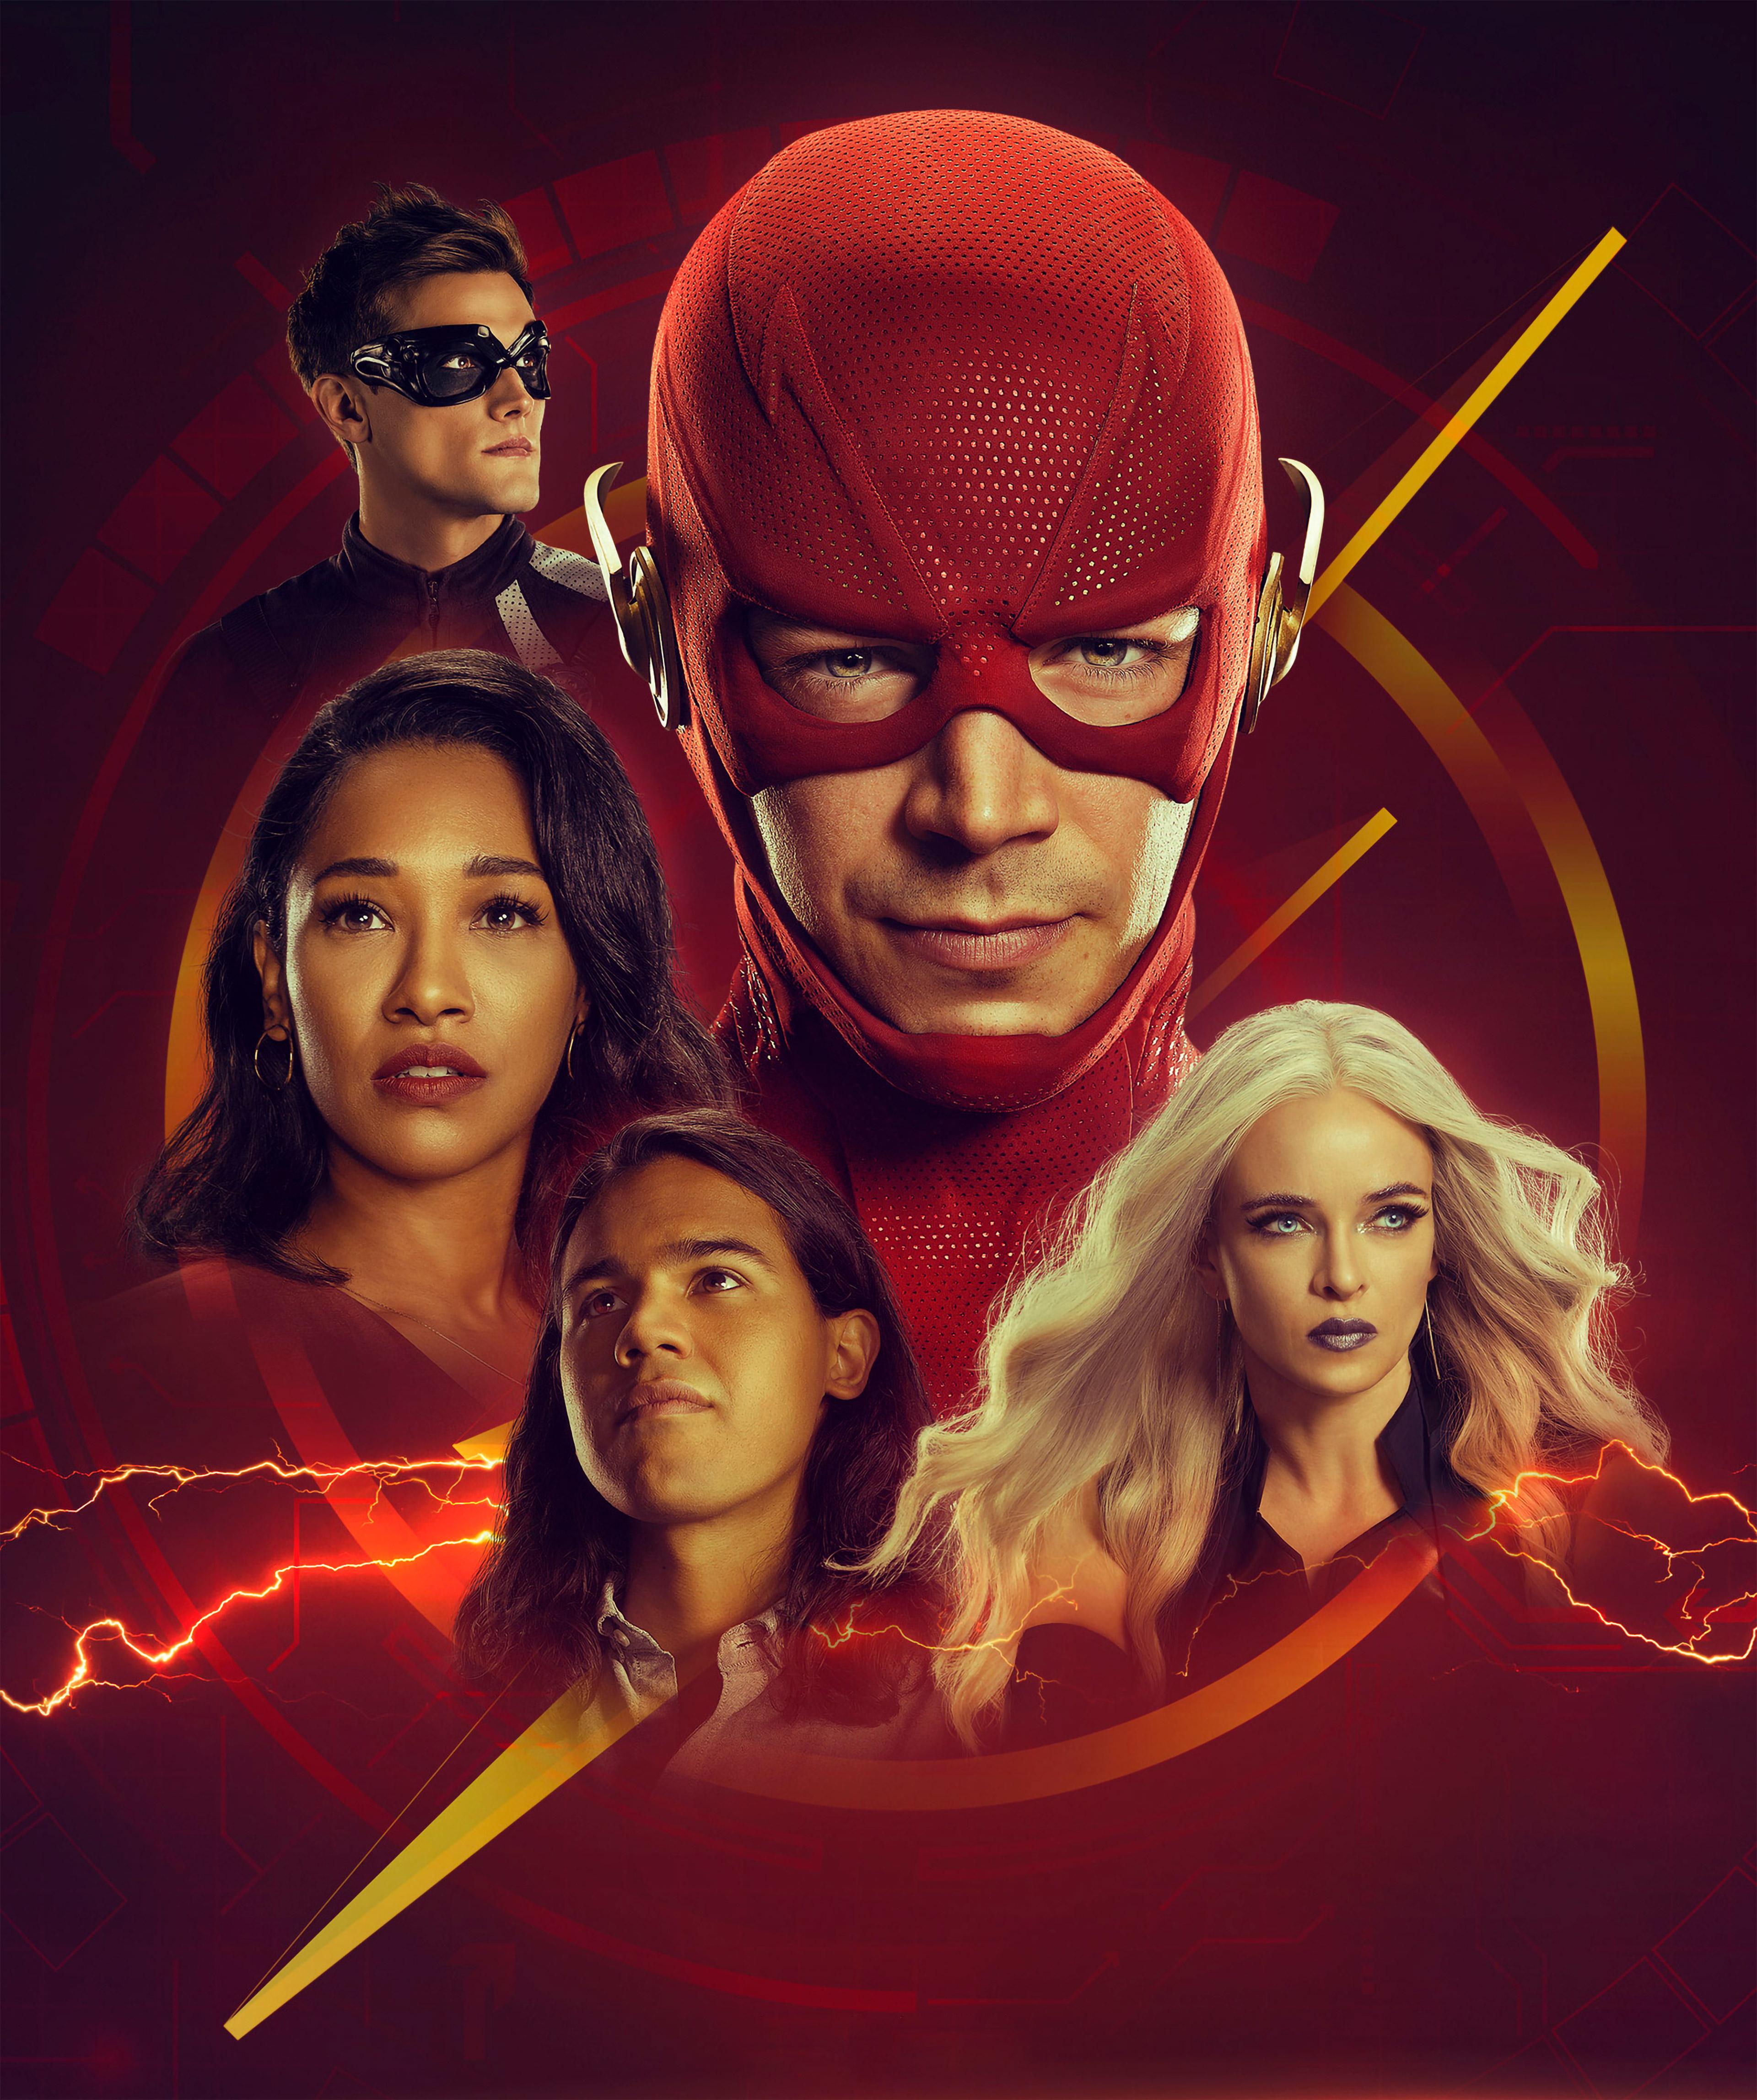 The Flash Season 6 Wallpaper Hd Tv Series 4k Wallpapers Images